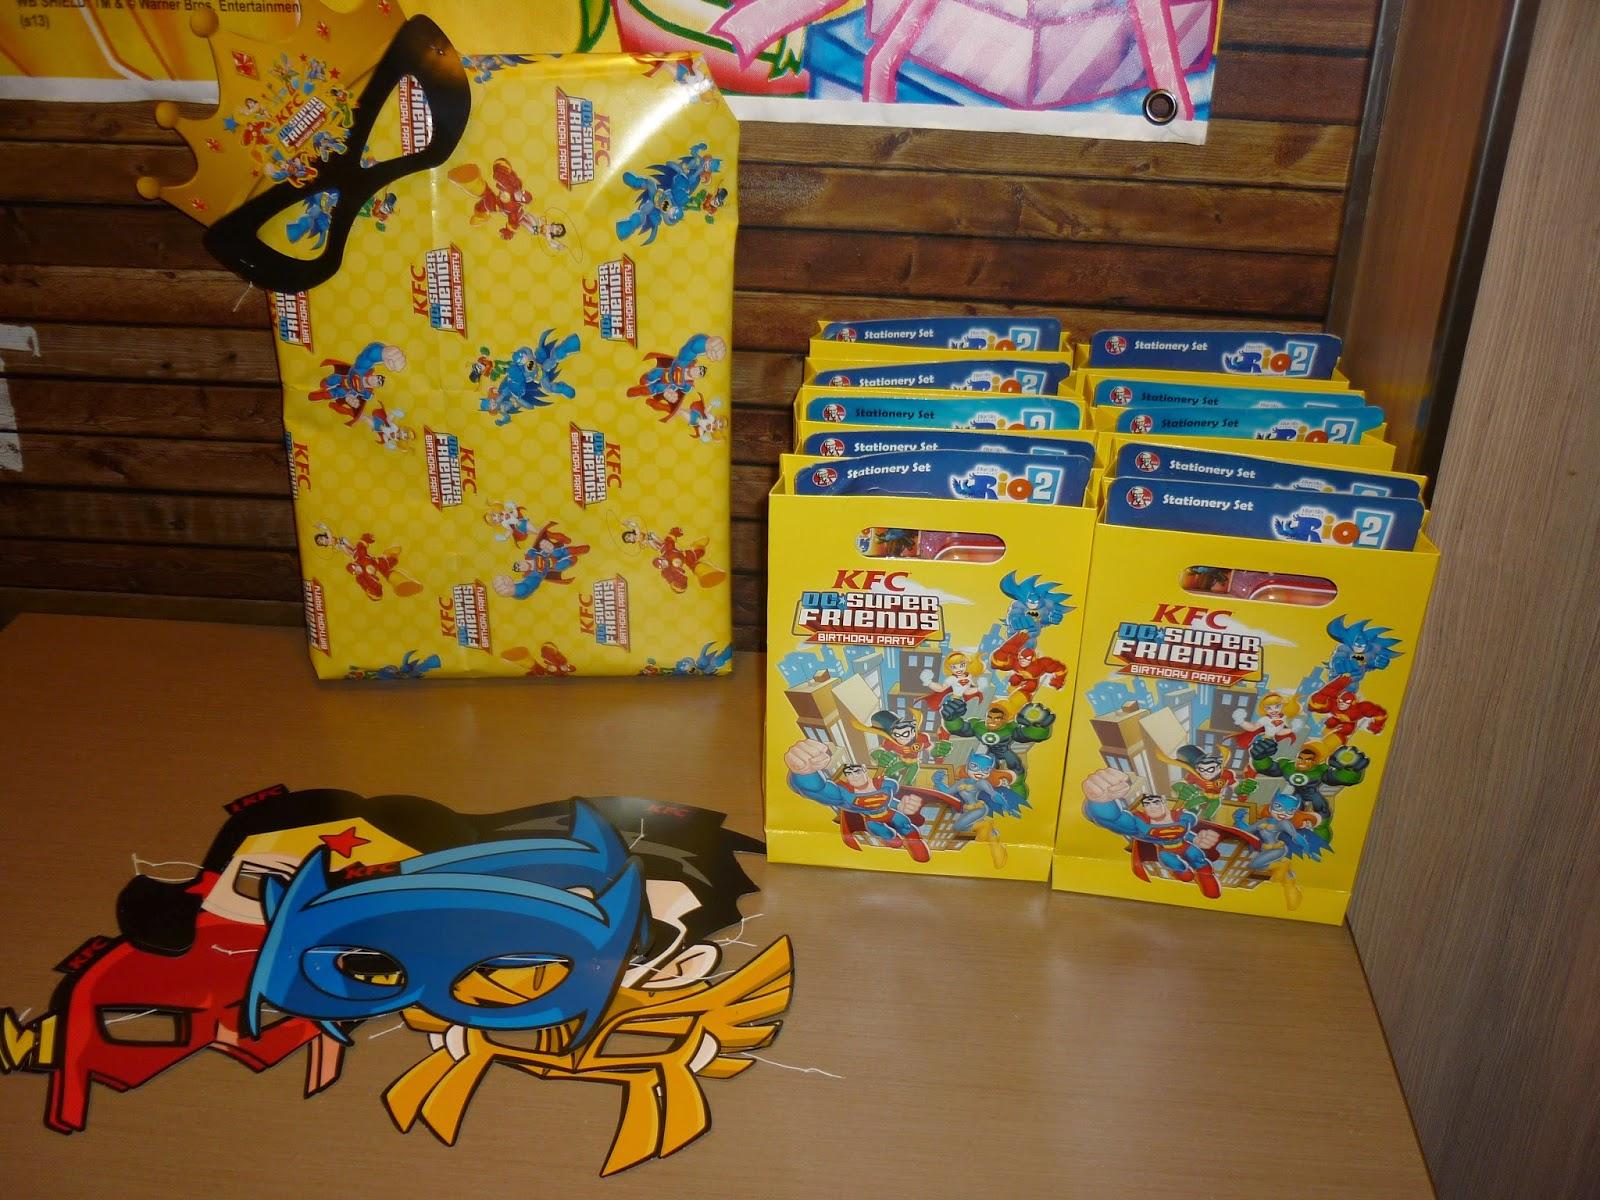 My Girls Birthday Party Kfc Aeon Big Wangsa Maju Weekend Treat